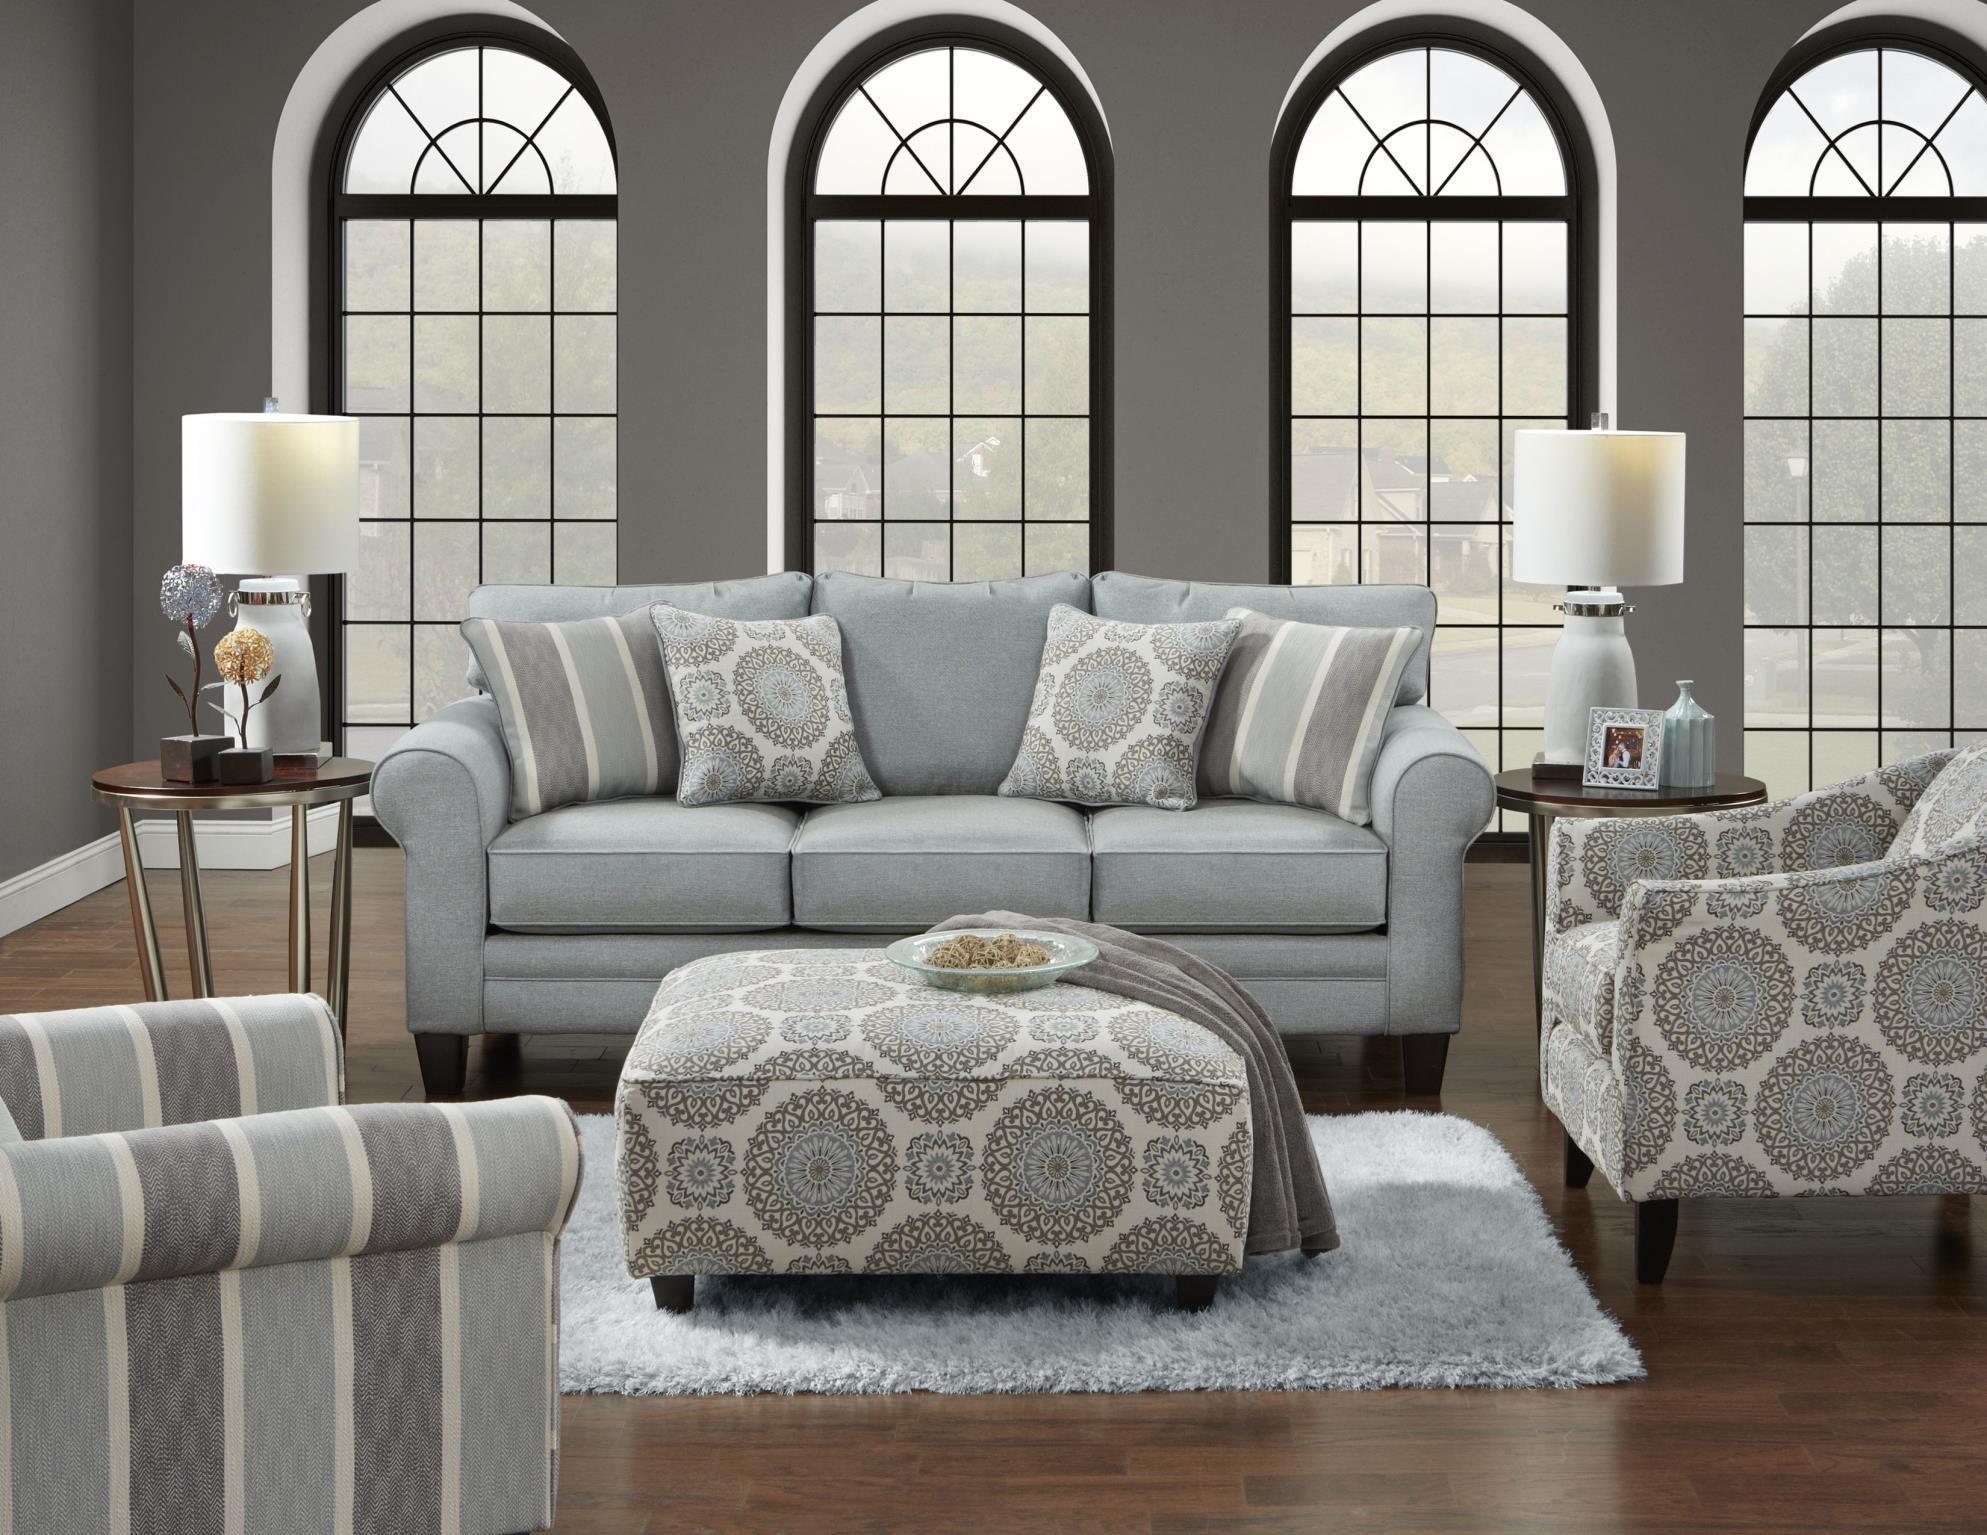 Fusion Furniture 1140 Grande Mist Living RoomFurniture Fair